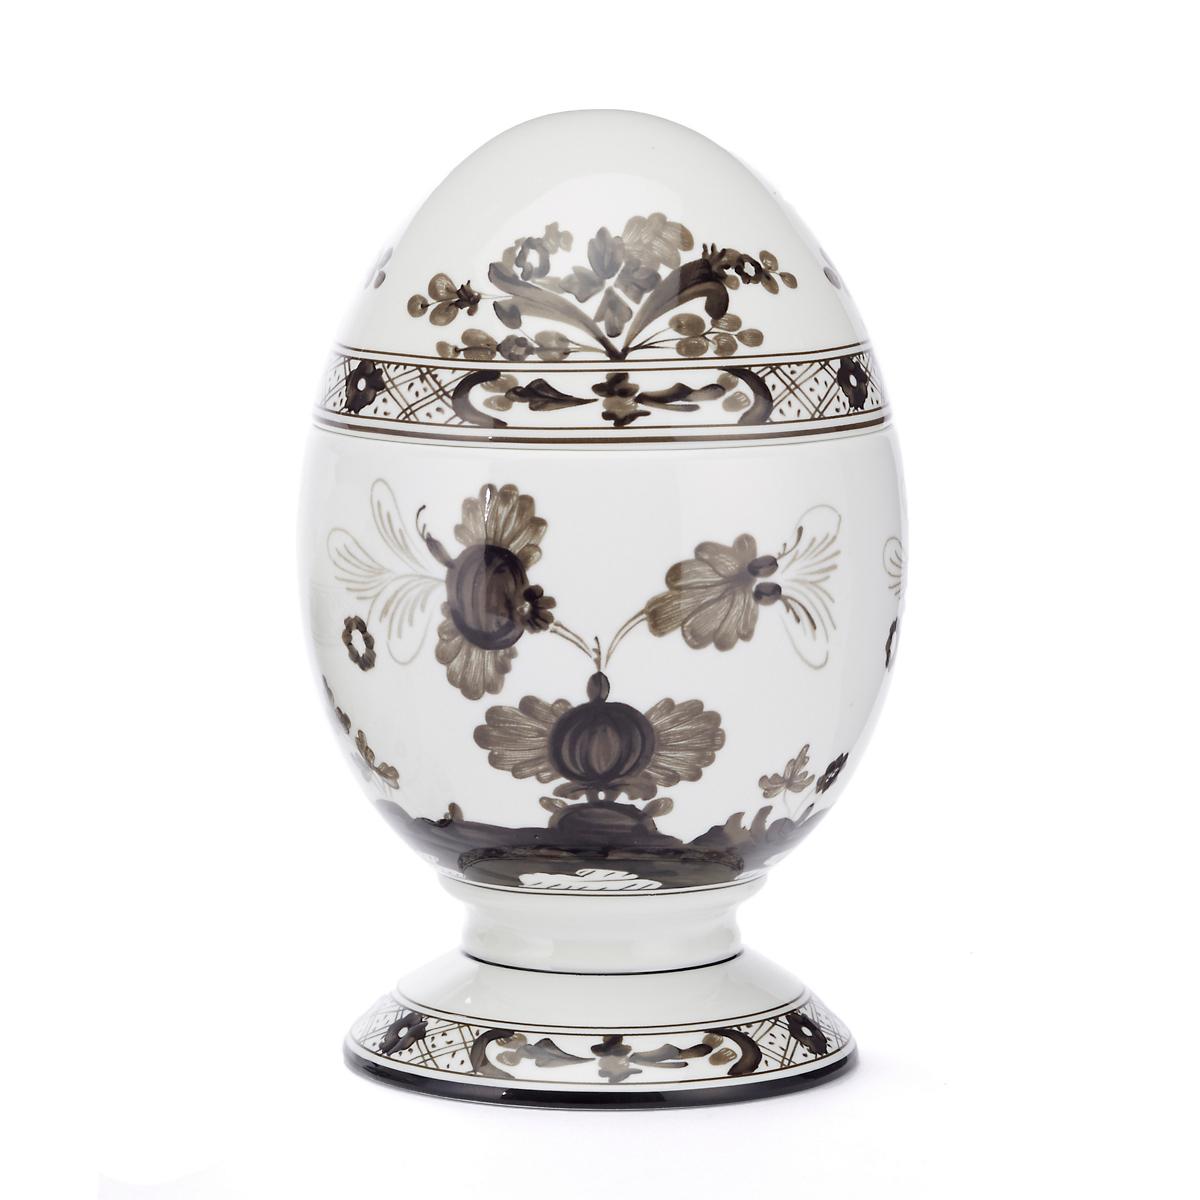 Richard Ginori Oriente Italiano Large Albus Egg | Gump\'s